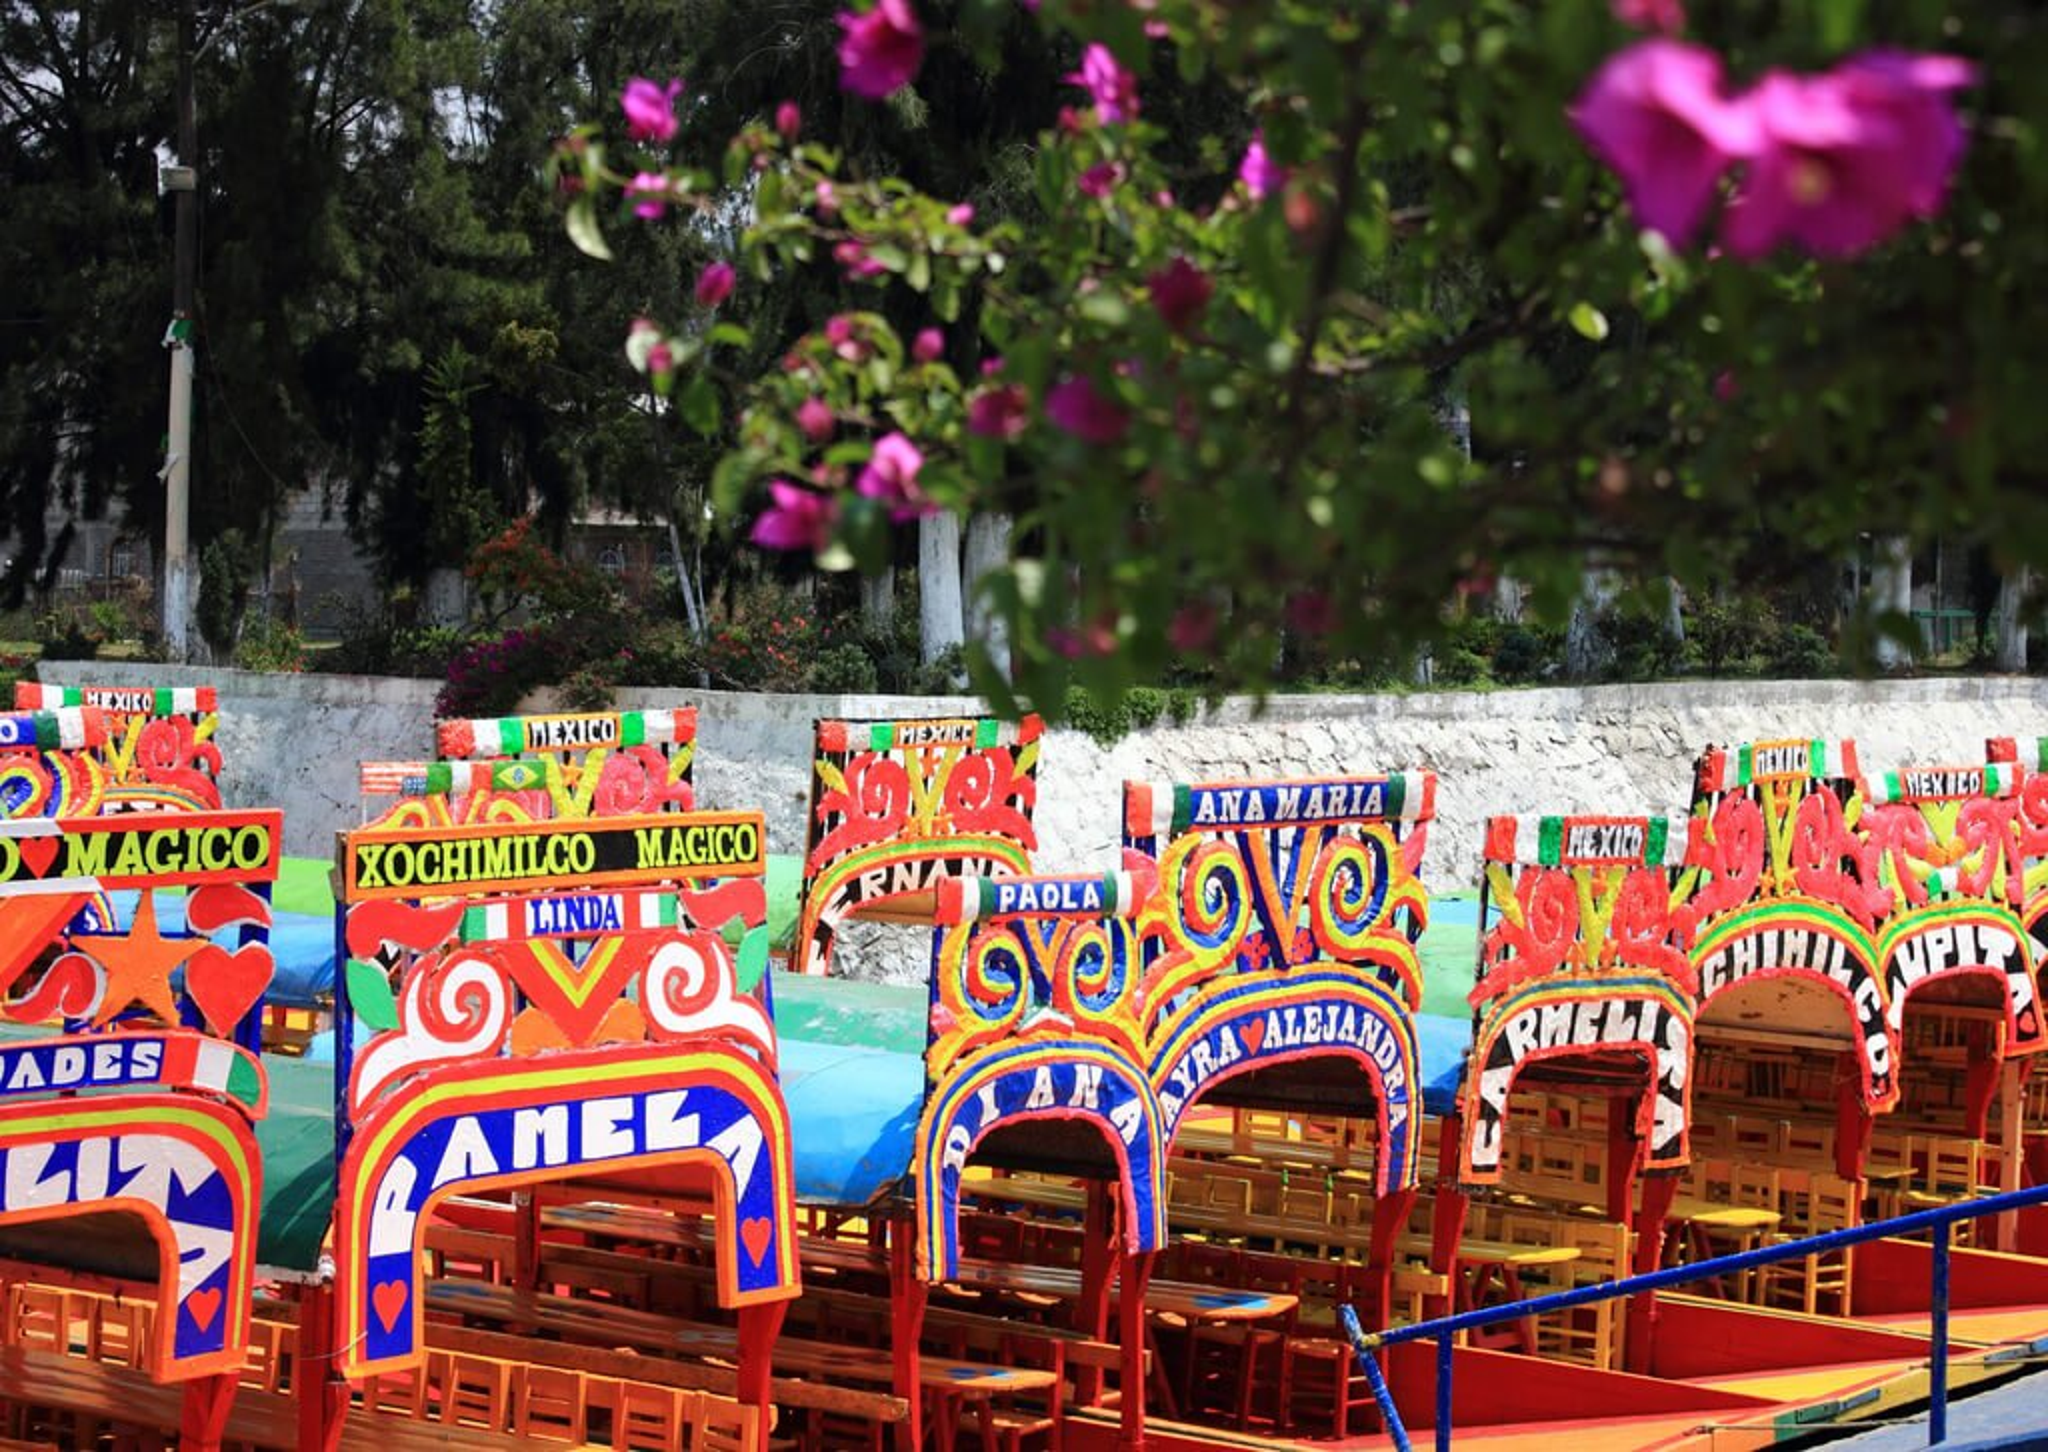 Croisi re aux jardins flottants de xochimilco for Jardin xochimilco